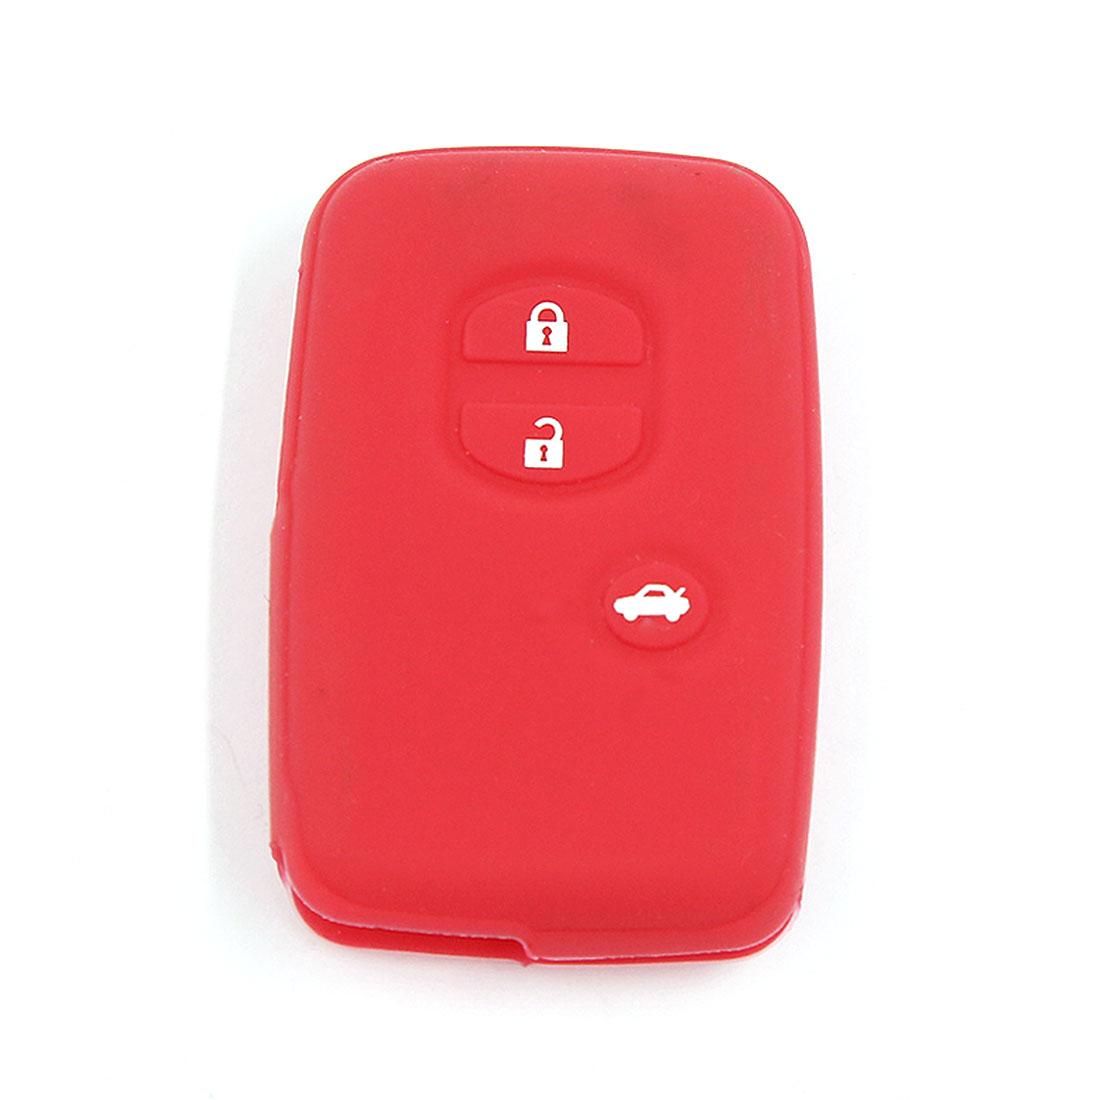 Red Silicone Car Remote Key Case Cover Fits Toyota Land Cruiser Prado(2010) 3BT